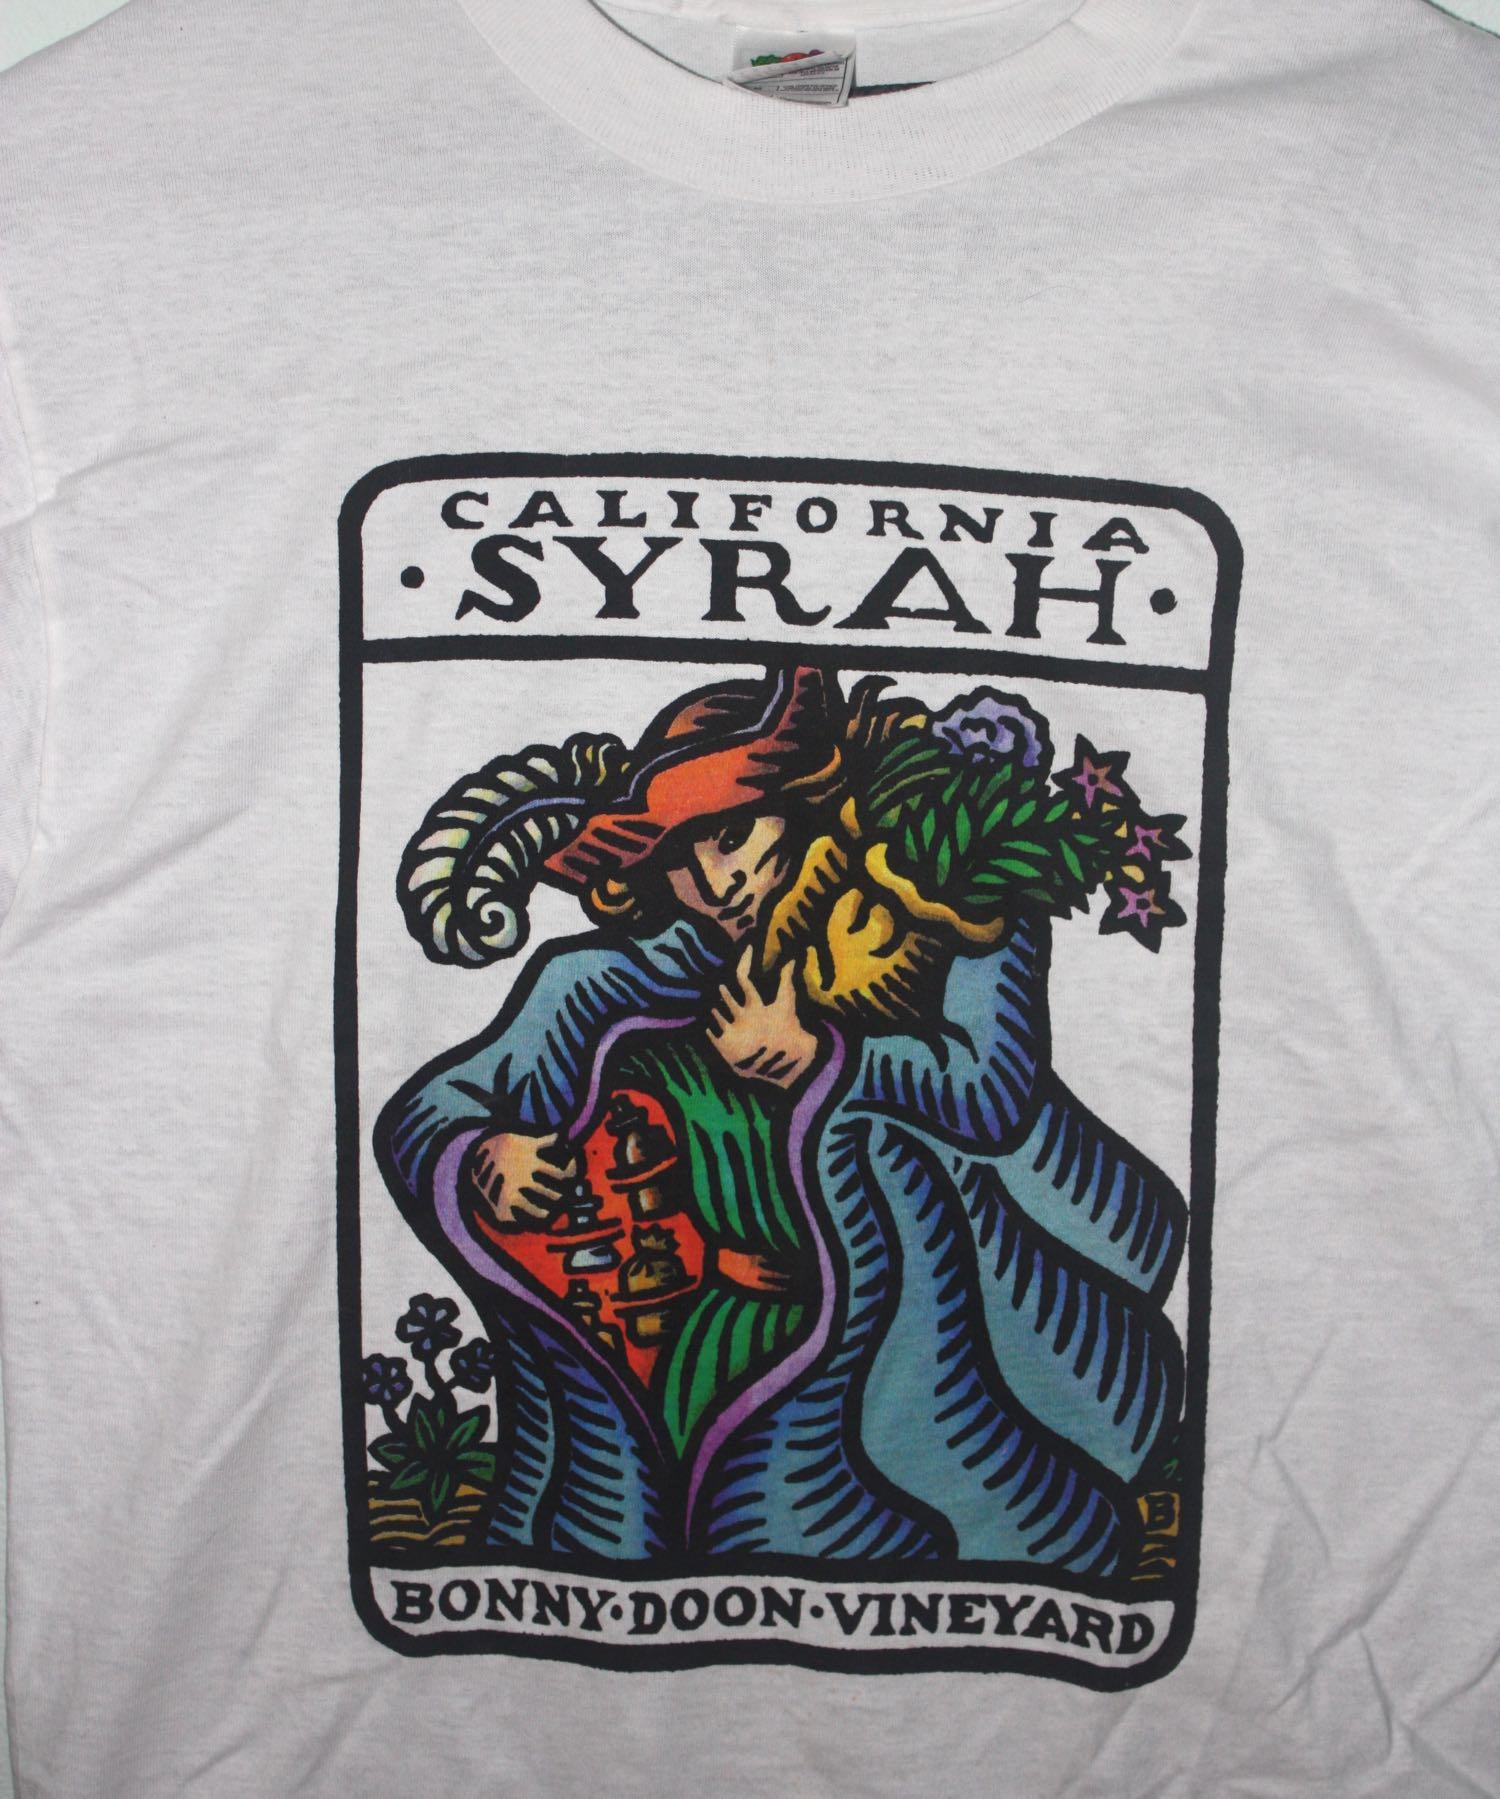 Santa Cruz BD Vinyards Sirah Tee 1